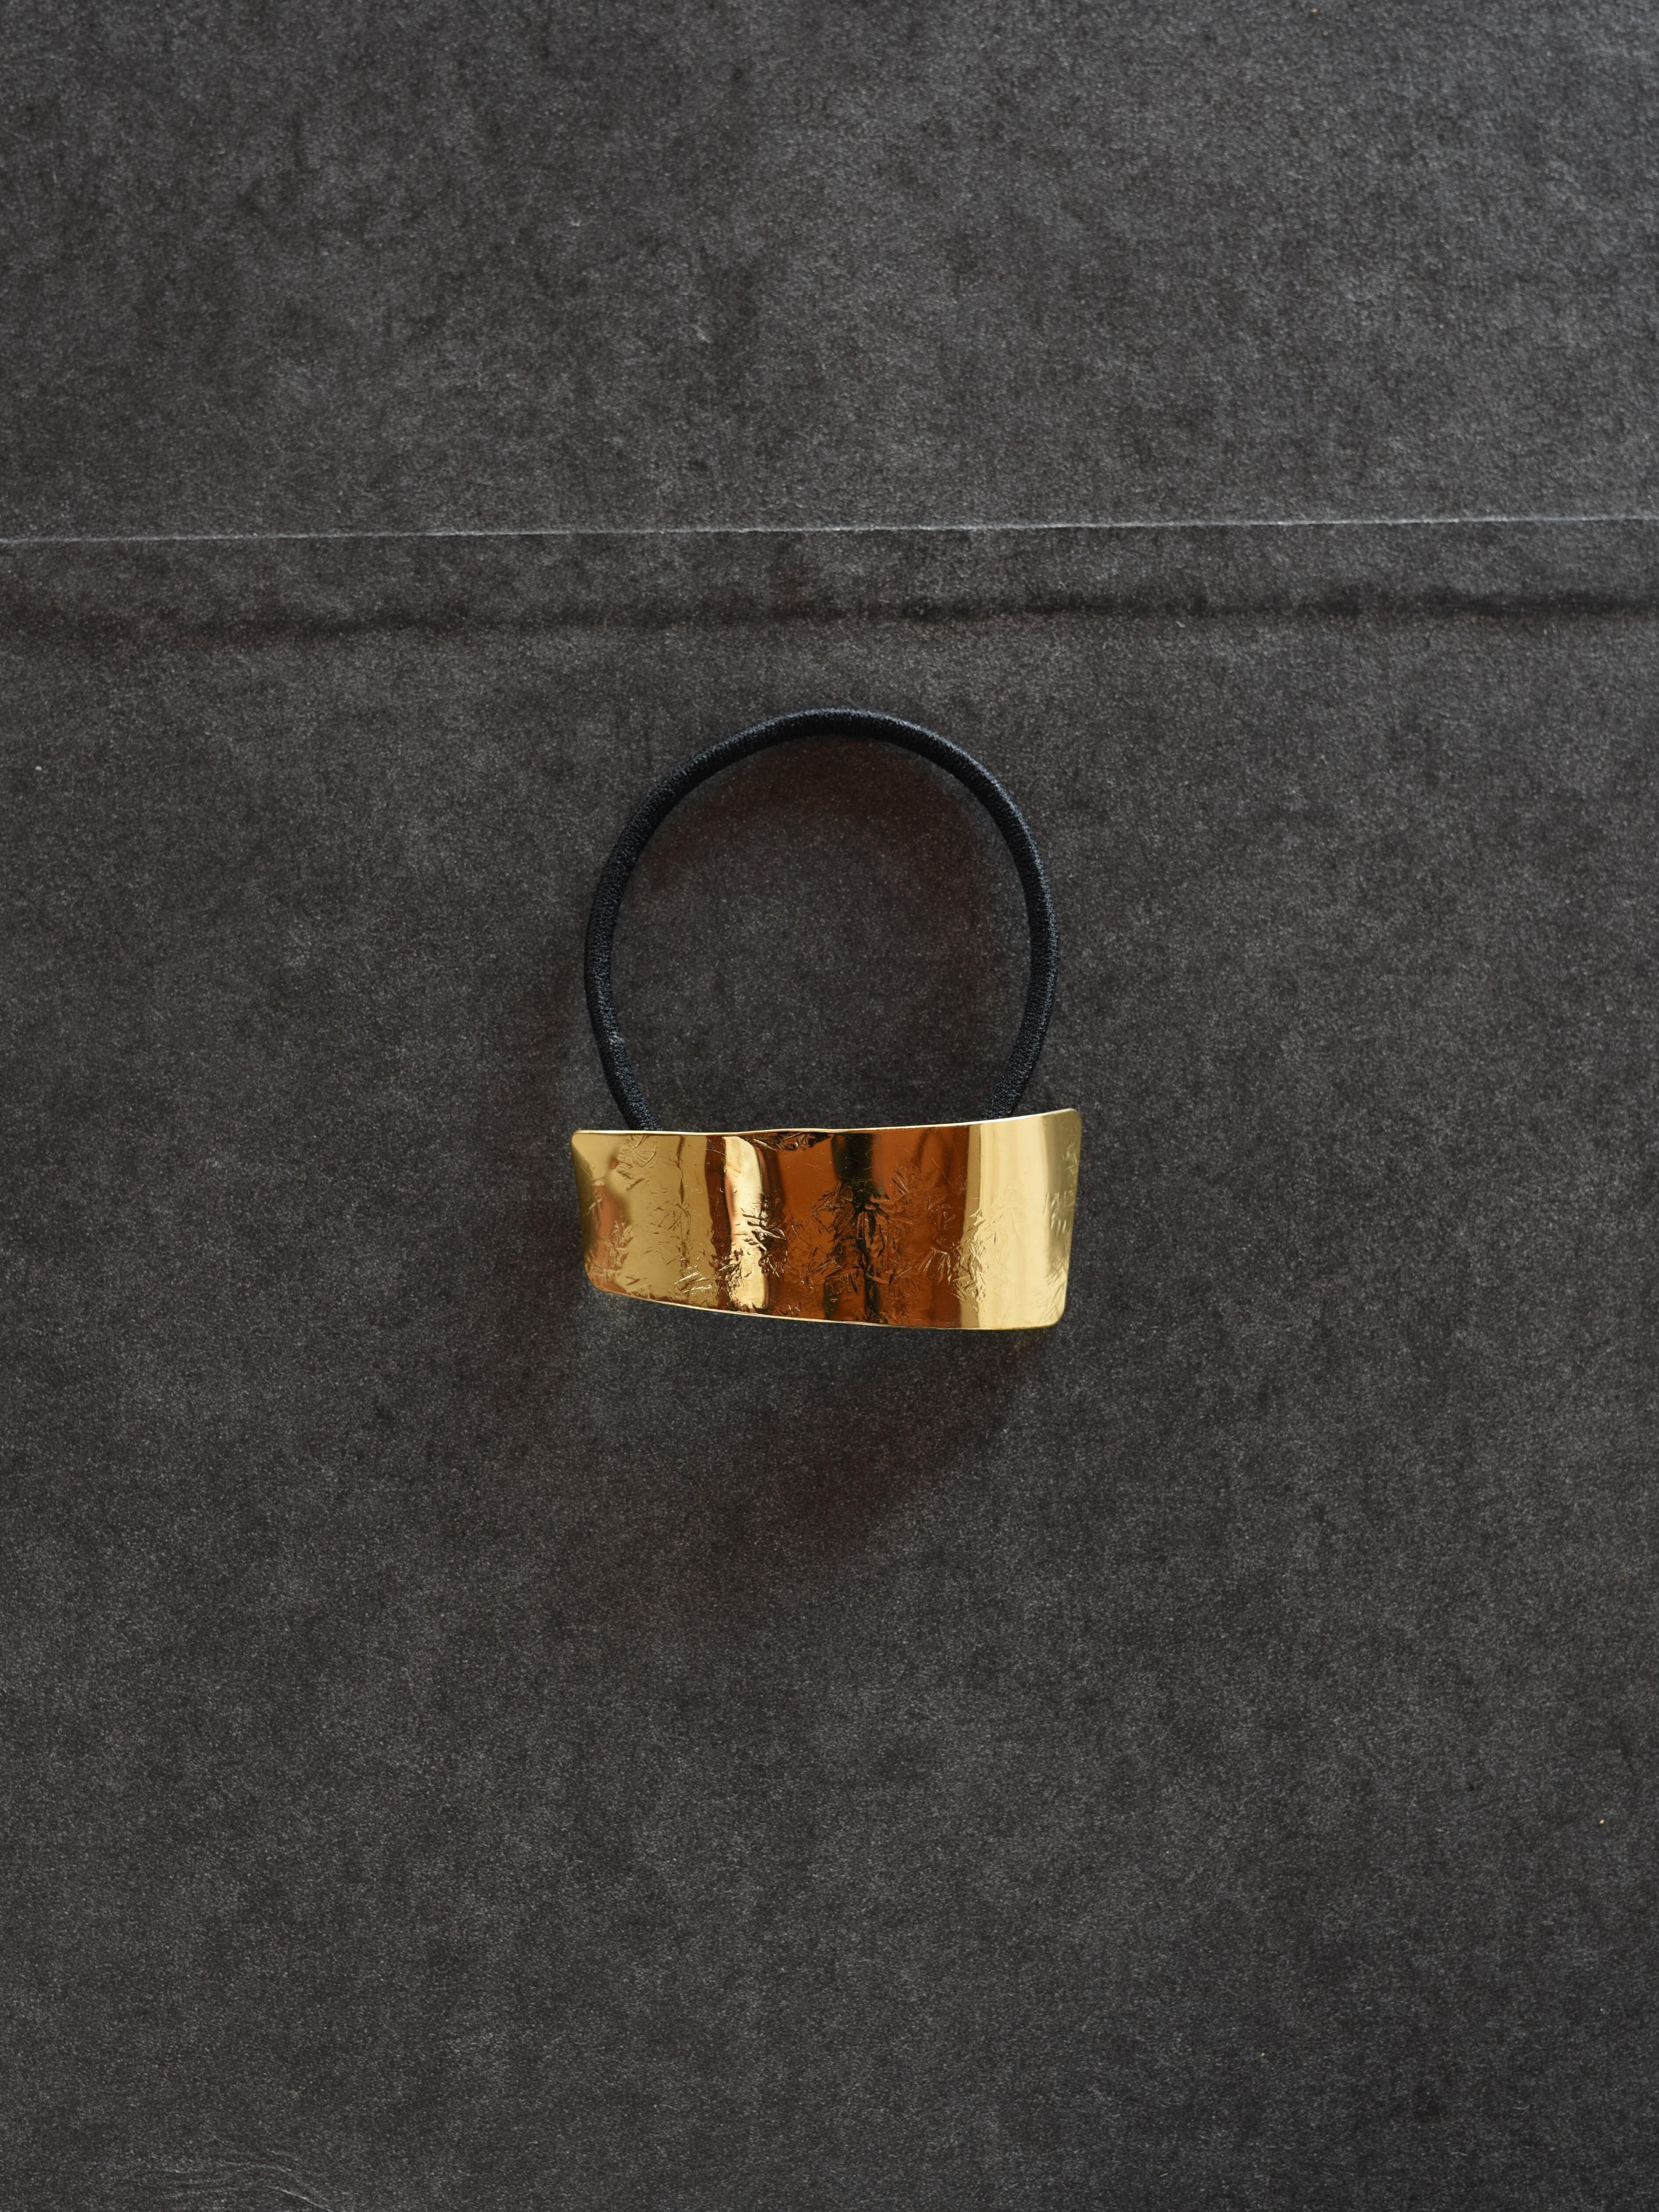 accessories mau|O-02-2 ヘアゴムbrass